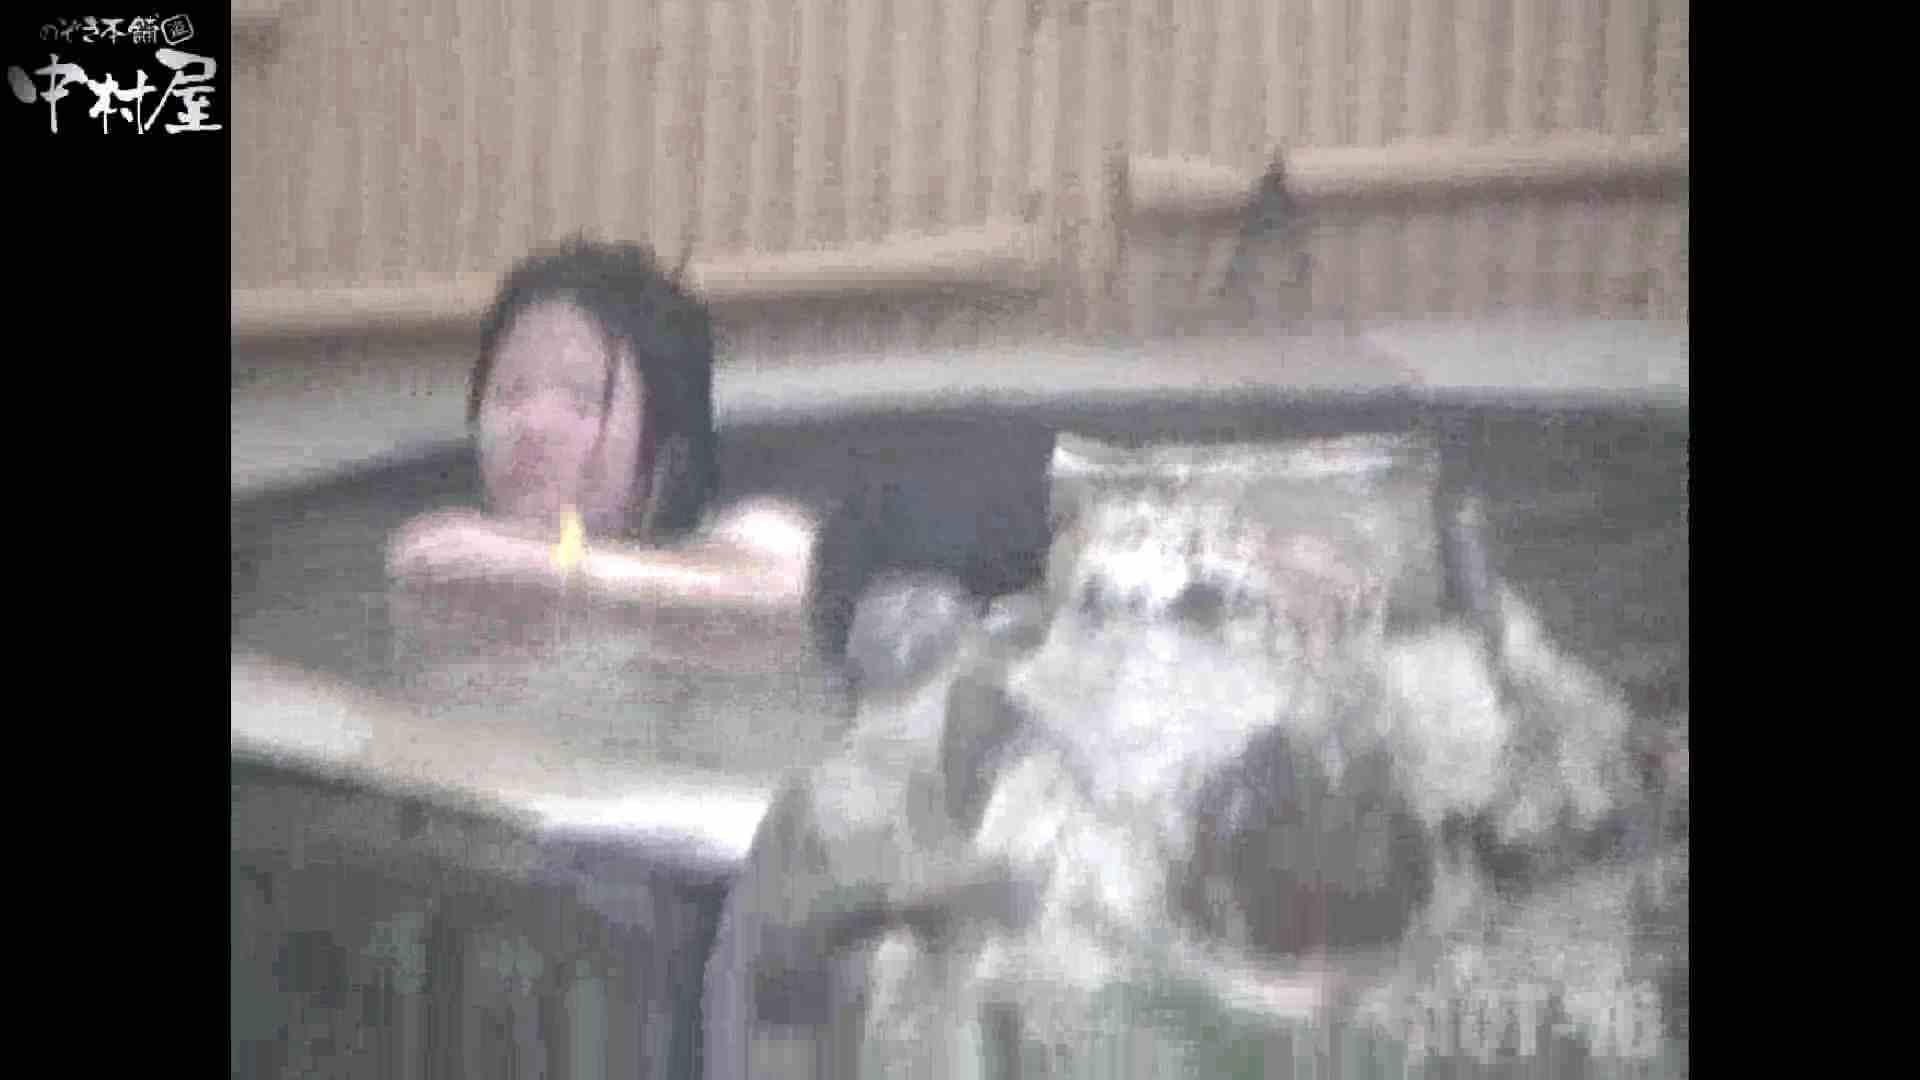 Aquaな露天風呂Vol.880潜入盗撮露天風呂十六判湯 其の八 潜入 おまんこ動画流出 99PIX 89